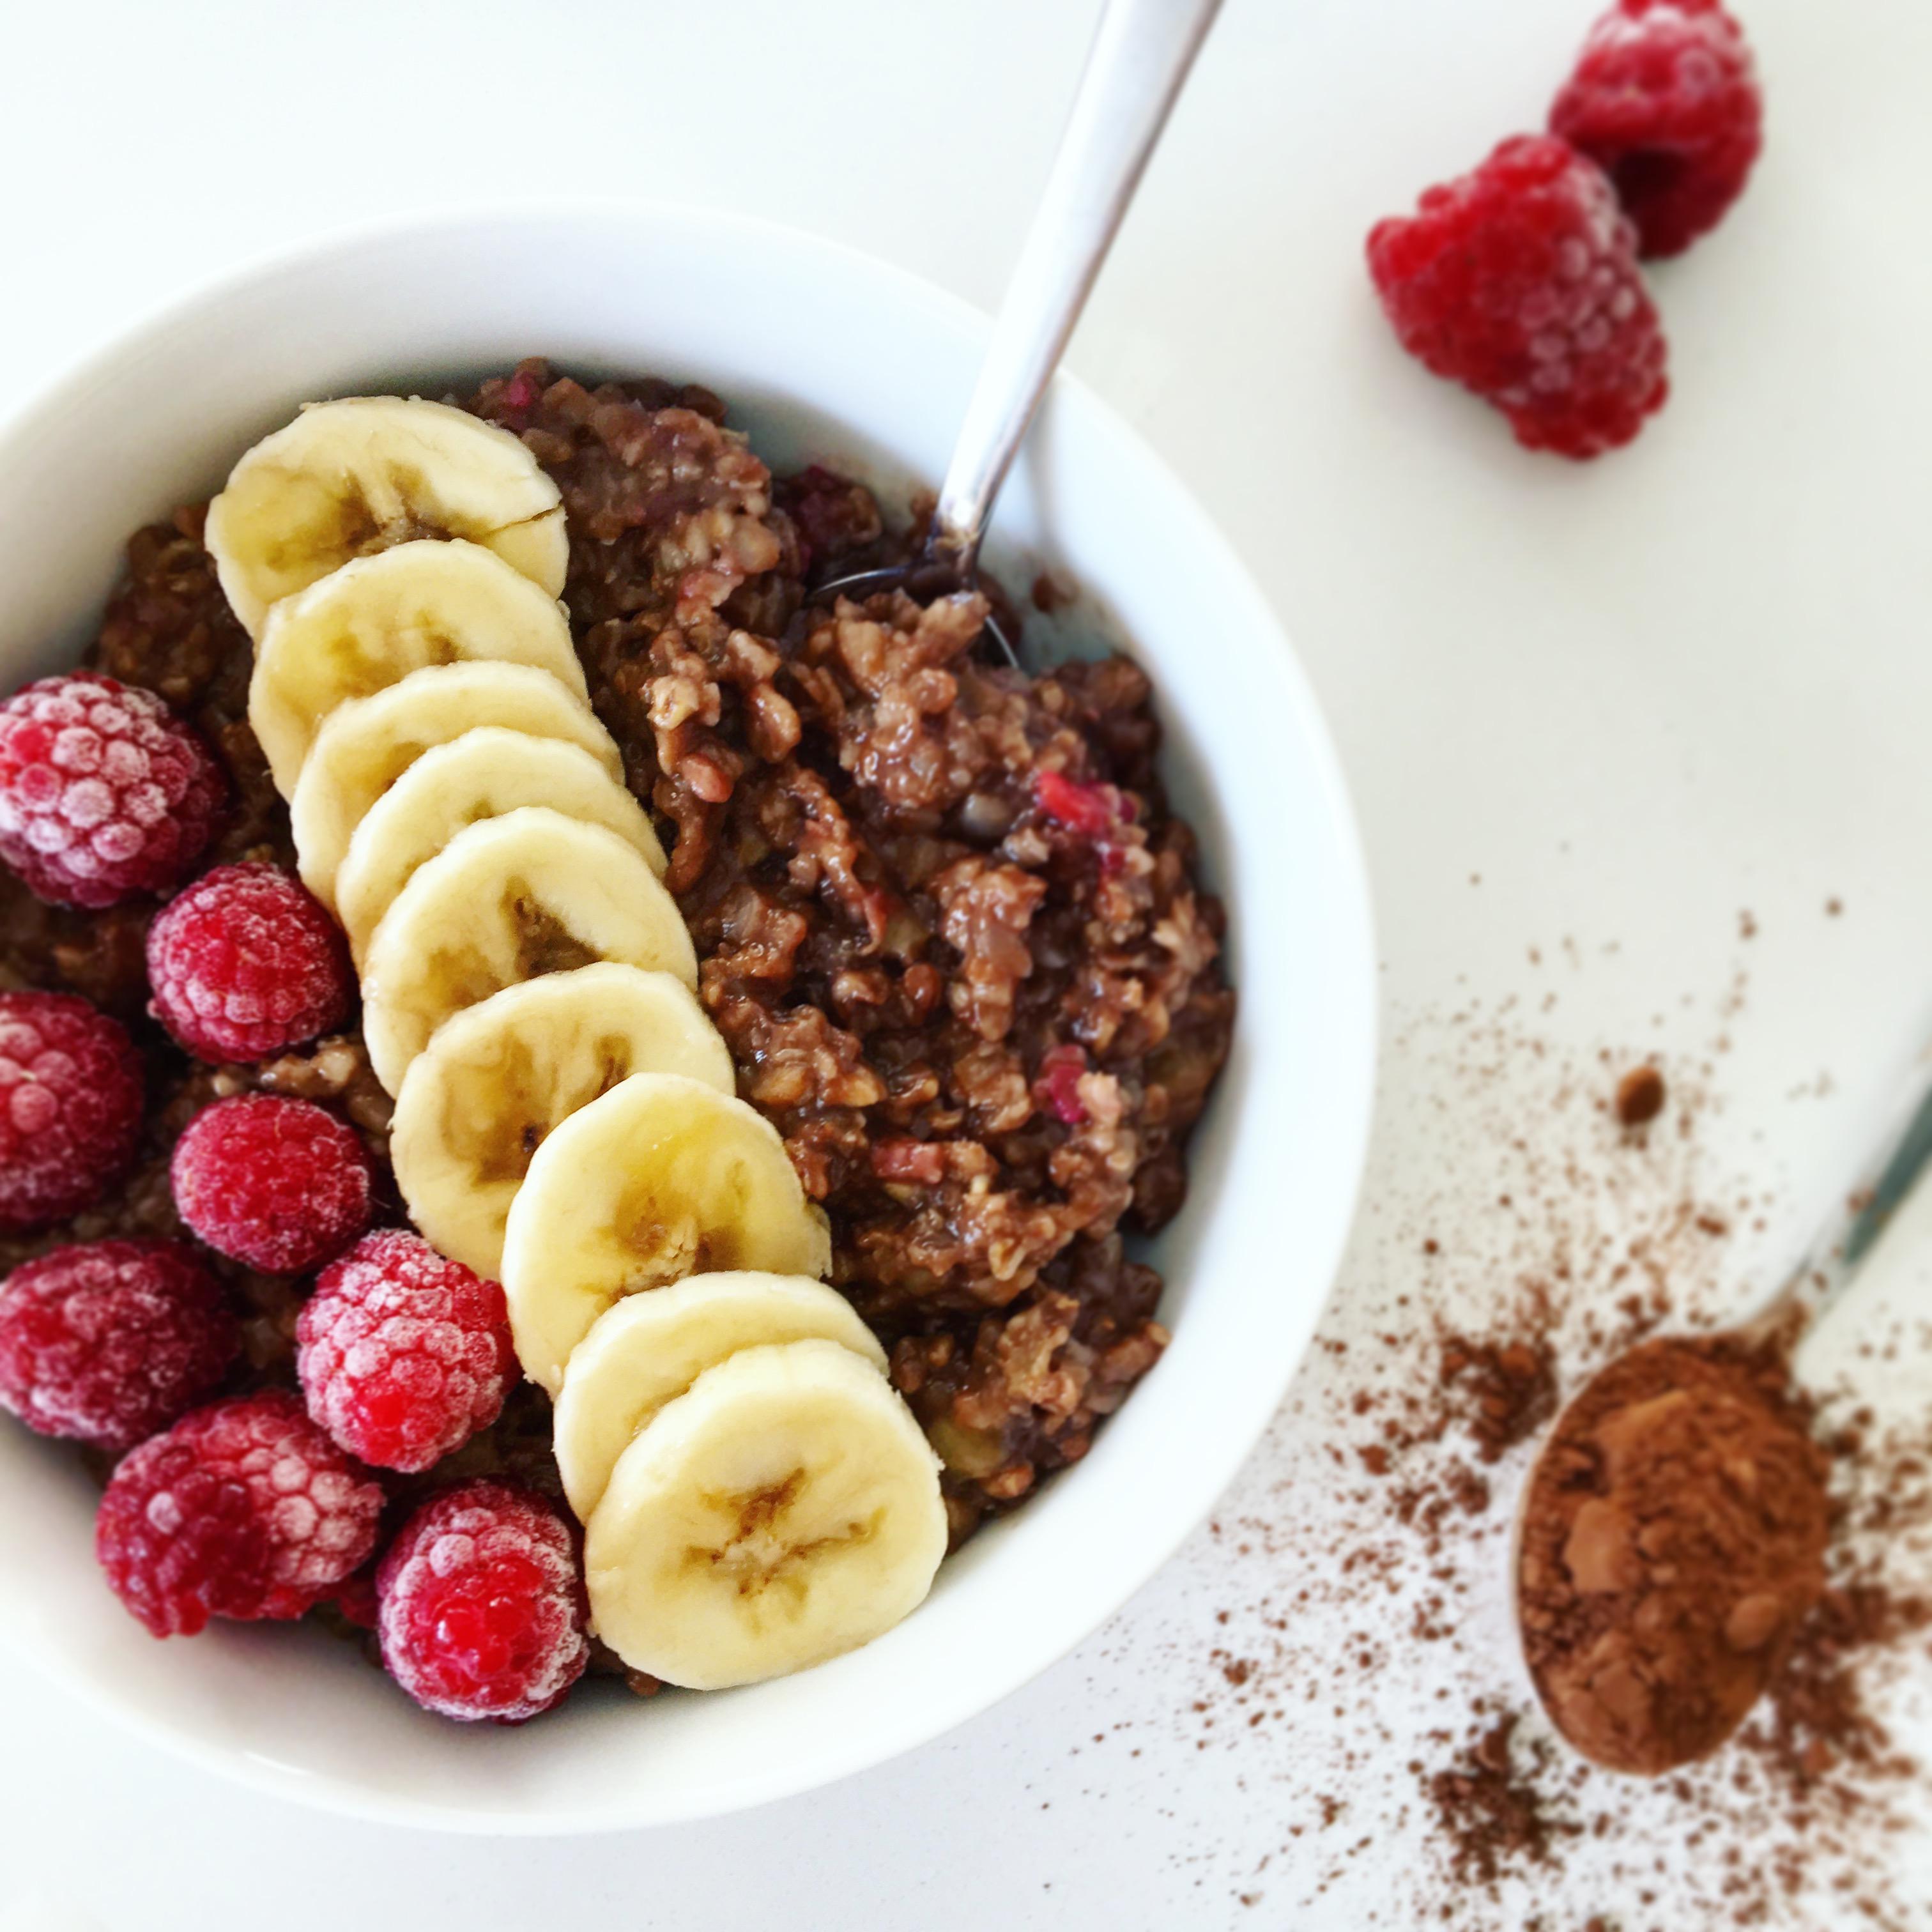 kakaos-bananos-malnas-zabkasa-5-hozzavalobol-szabo-jucustol_2.JPG